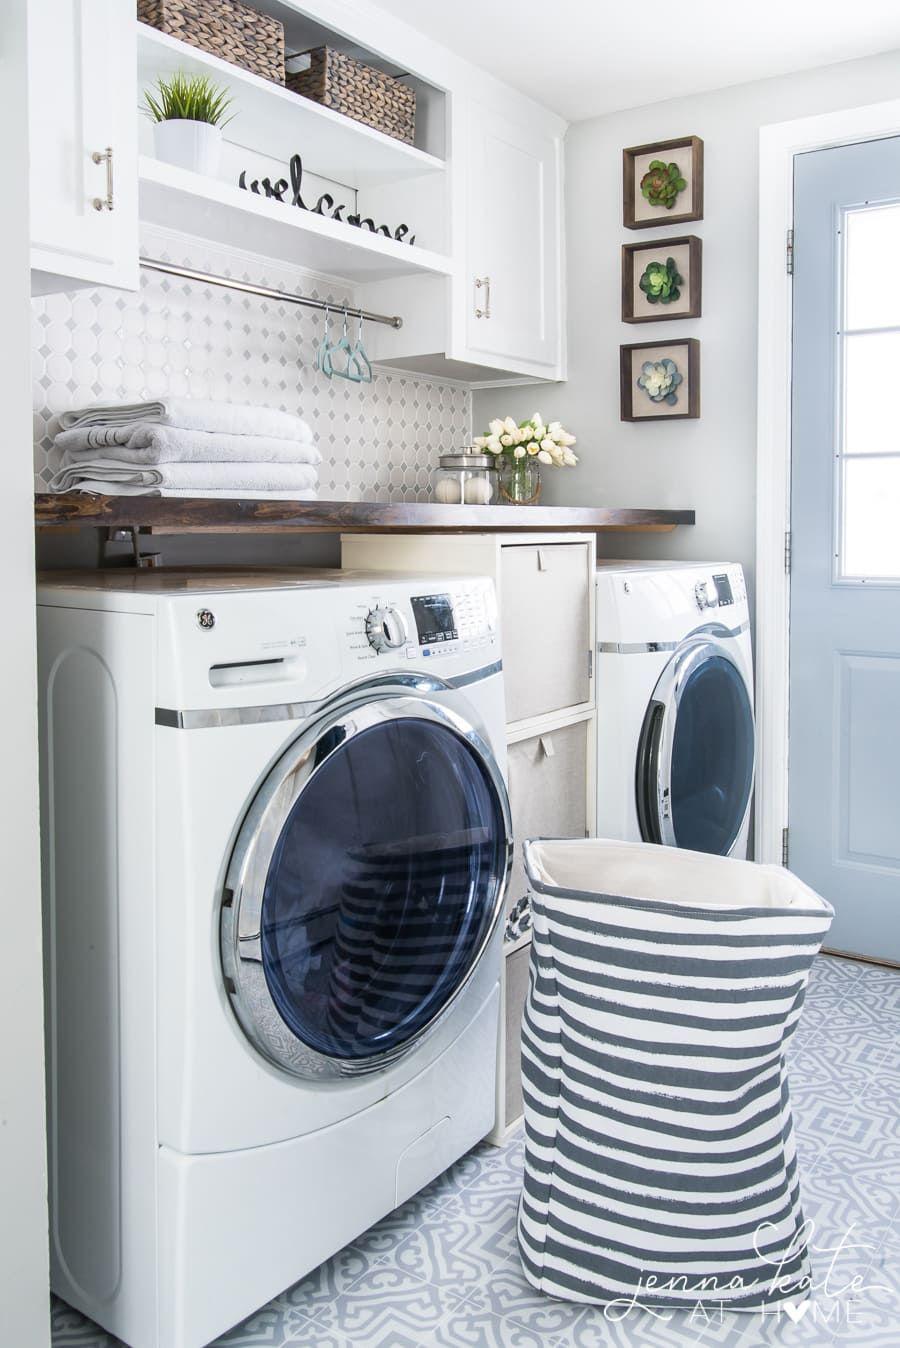 Laundry Room Diy Wood Countertop Laundry Room Inspiration Wood